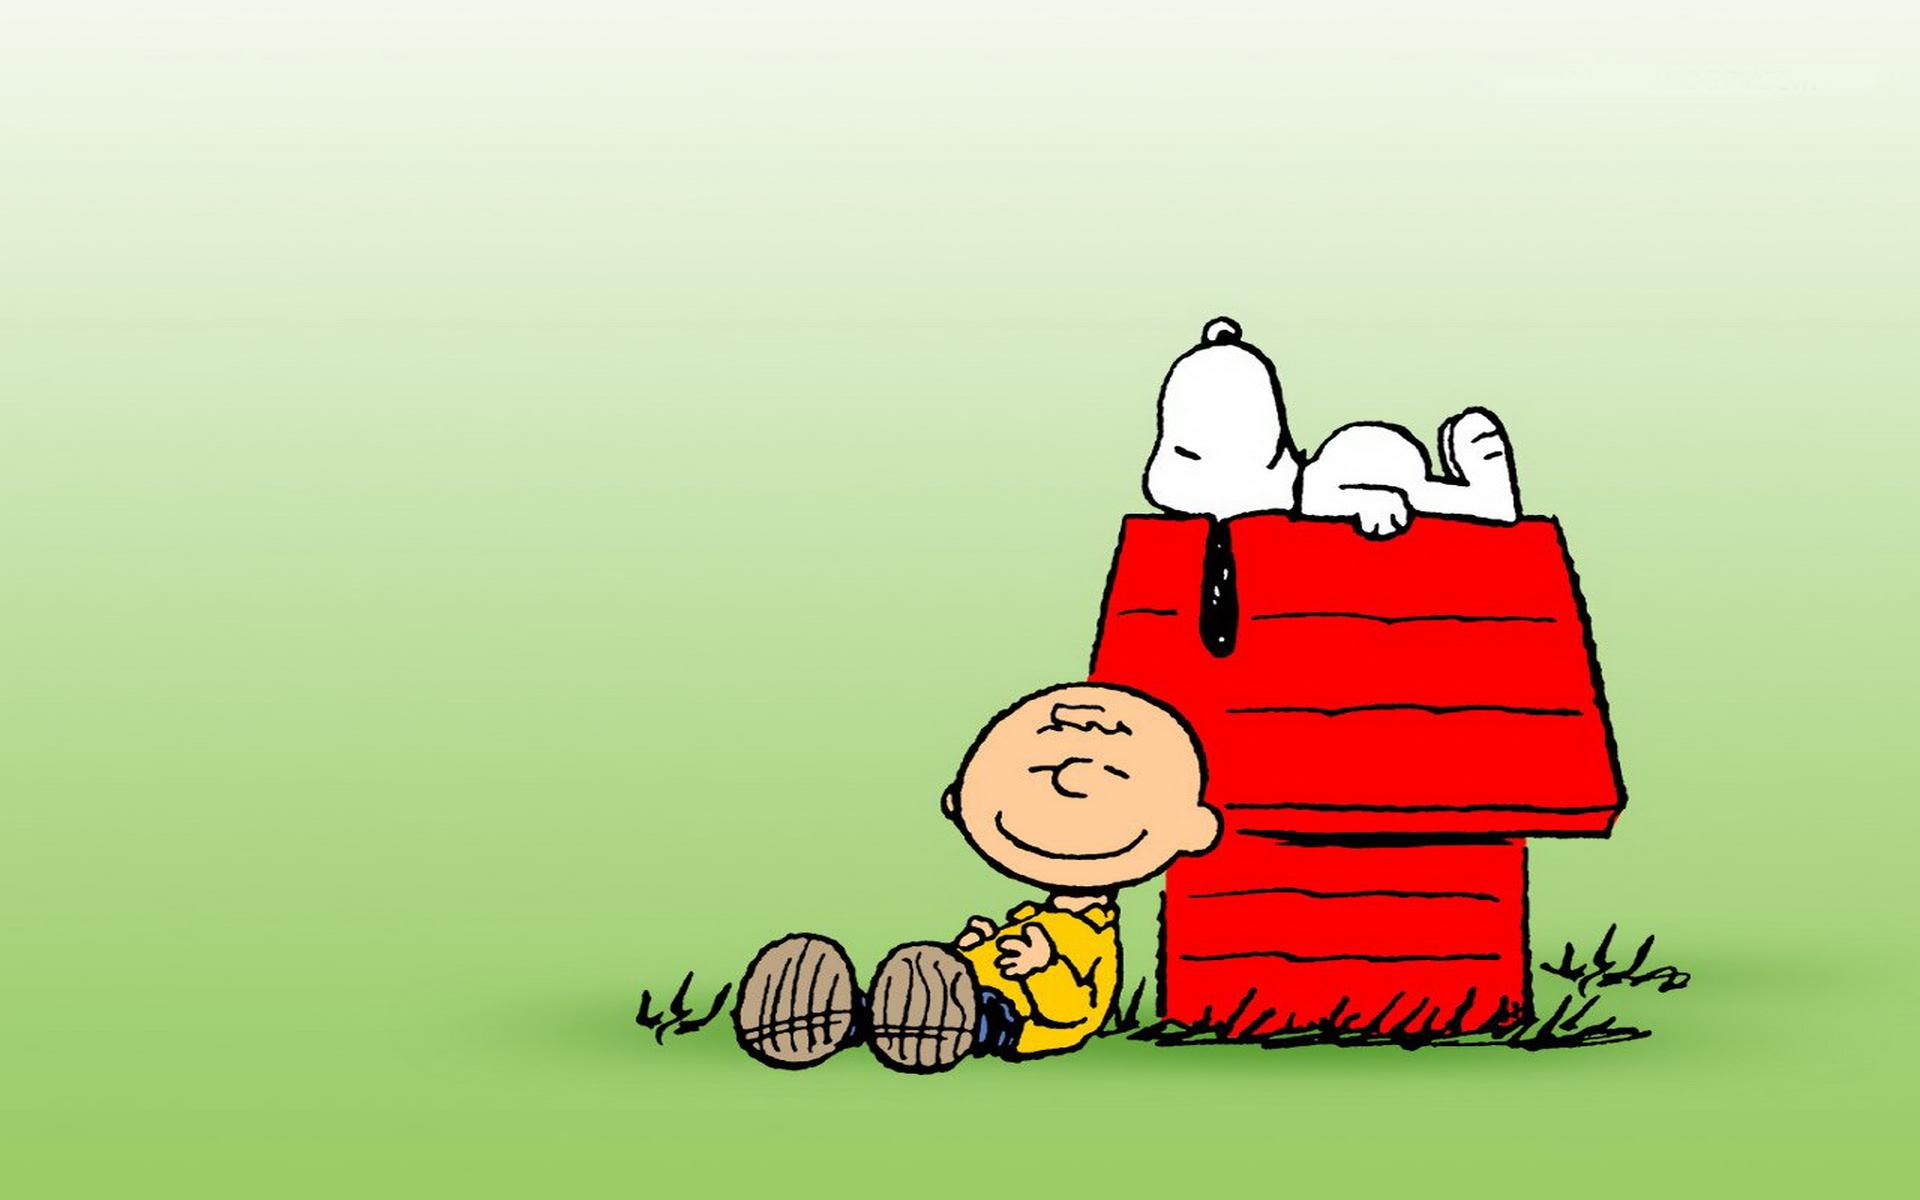 CHARLIE BROWN peanuts comics snoopy g wallpaper ...